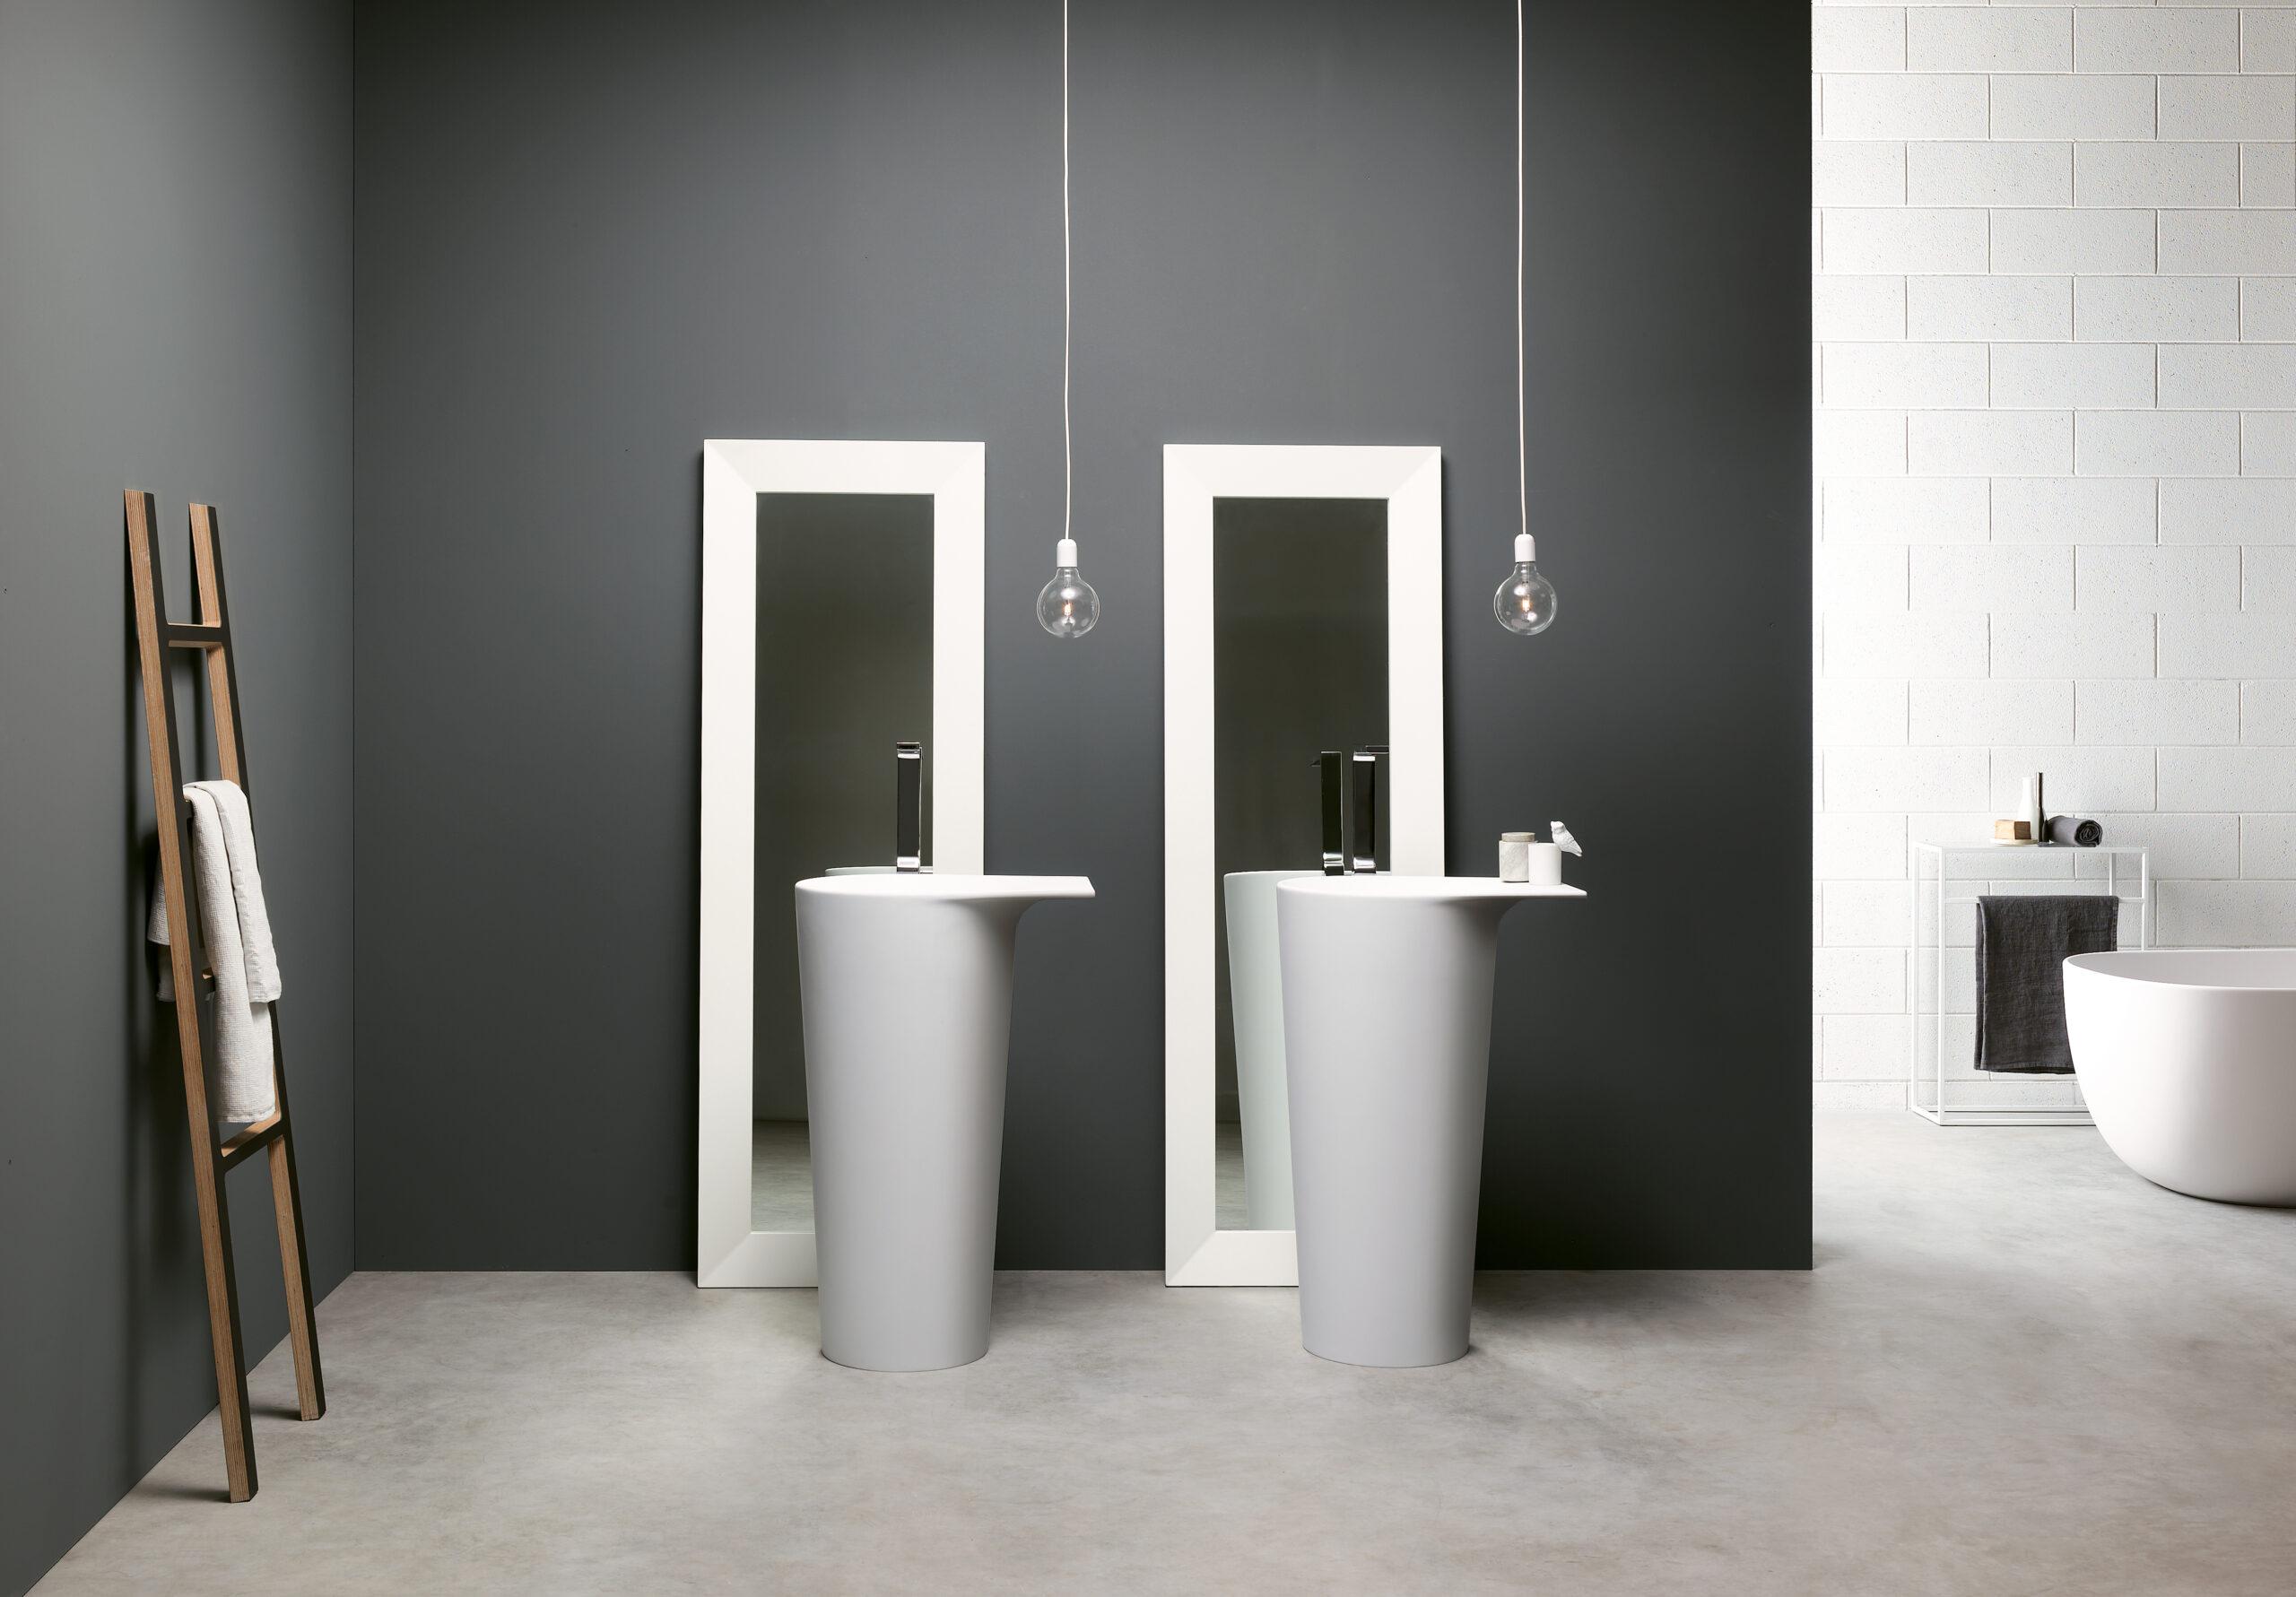 Freestanding Ala washbasin by Debiasi Sandri for Toscoquattro